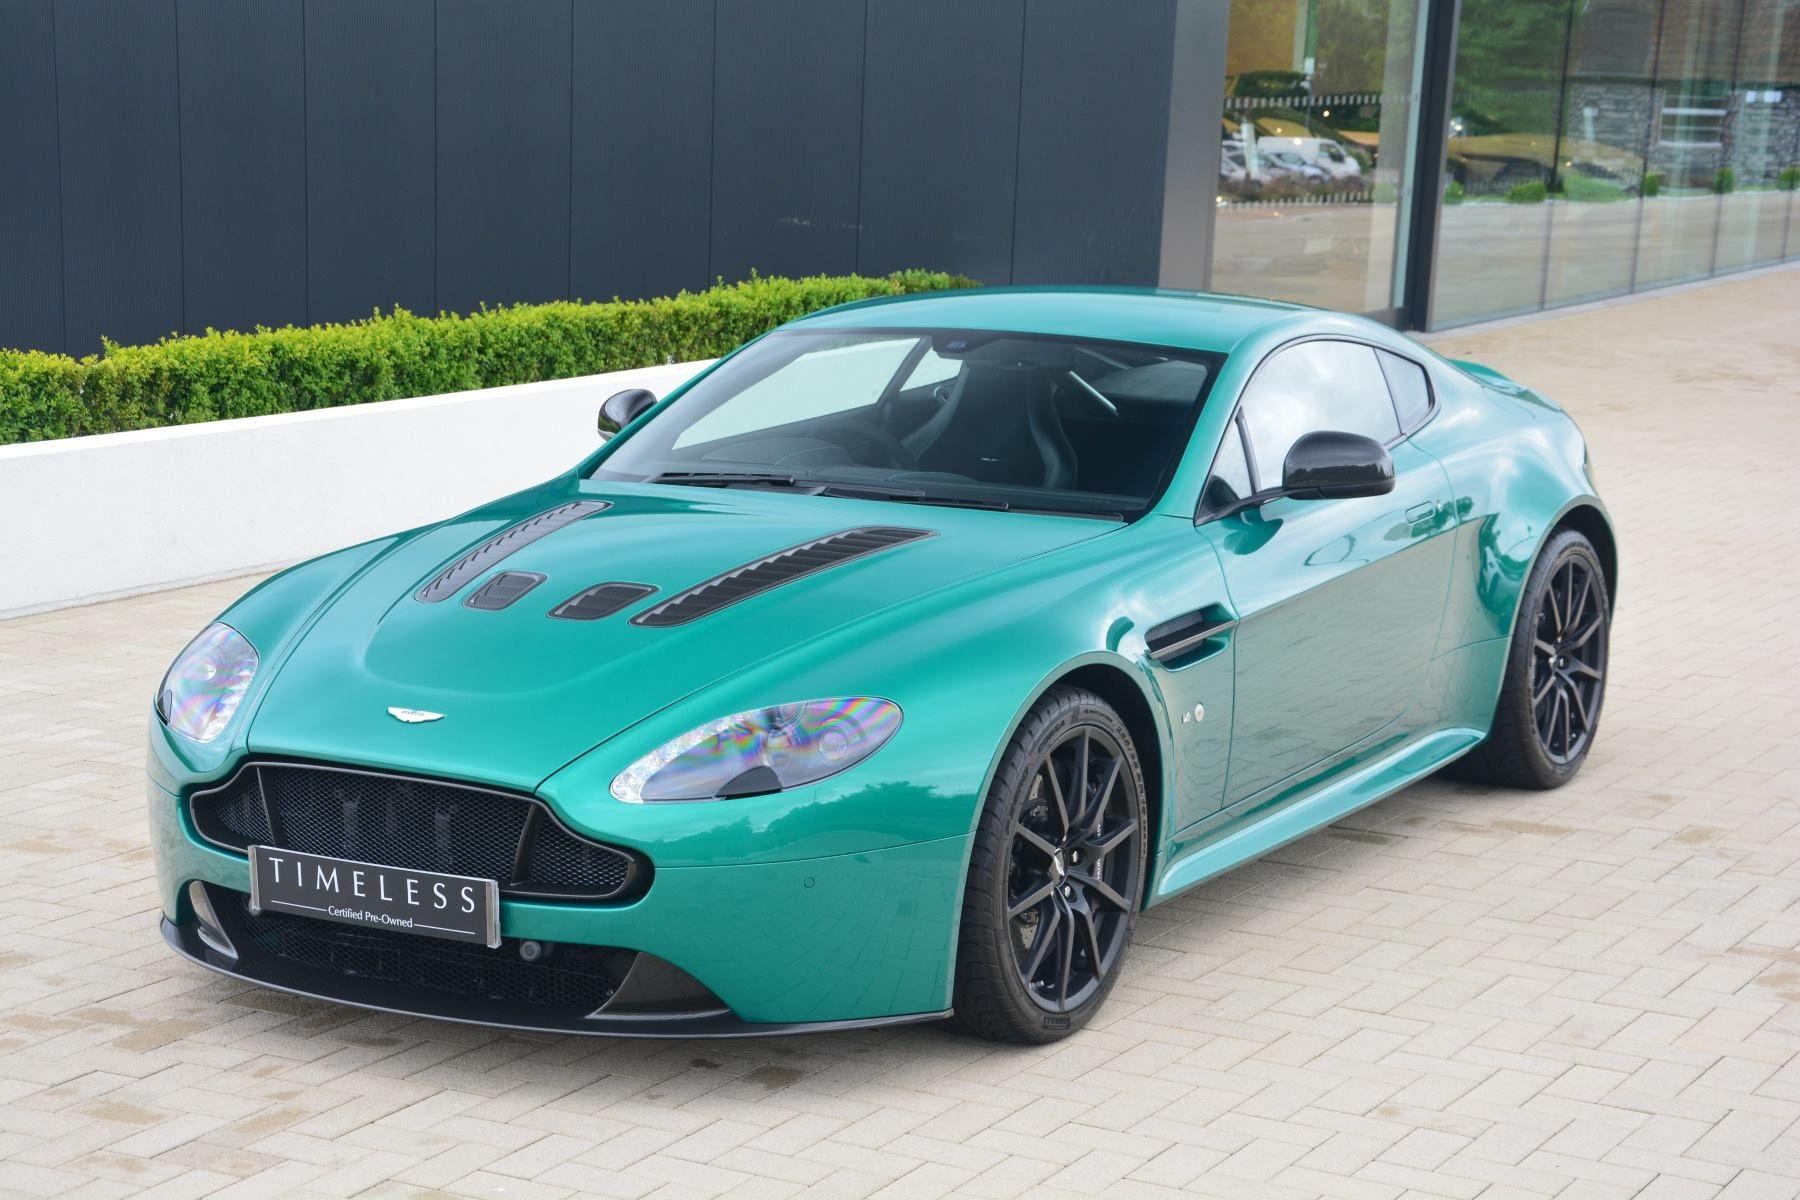 Aston Martin V12 Vantage S Viridian Green Aston Martin Sportwagen Traumauto